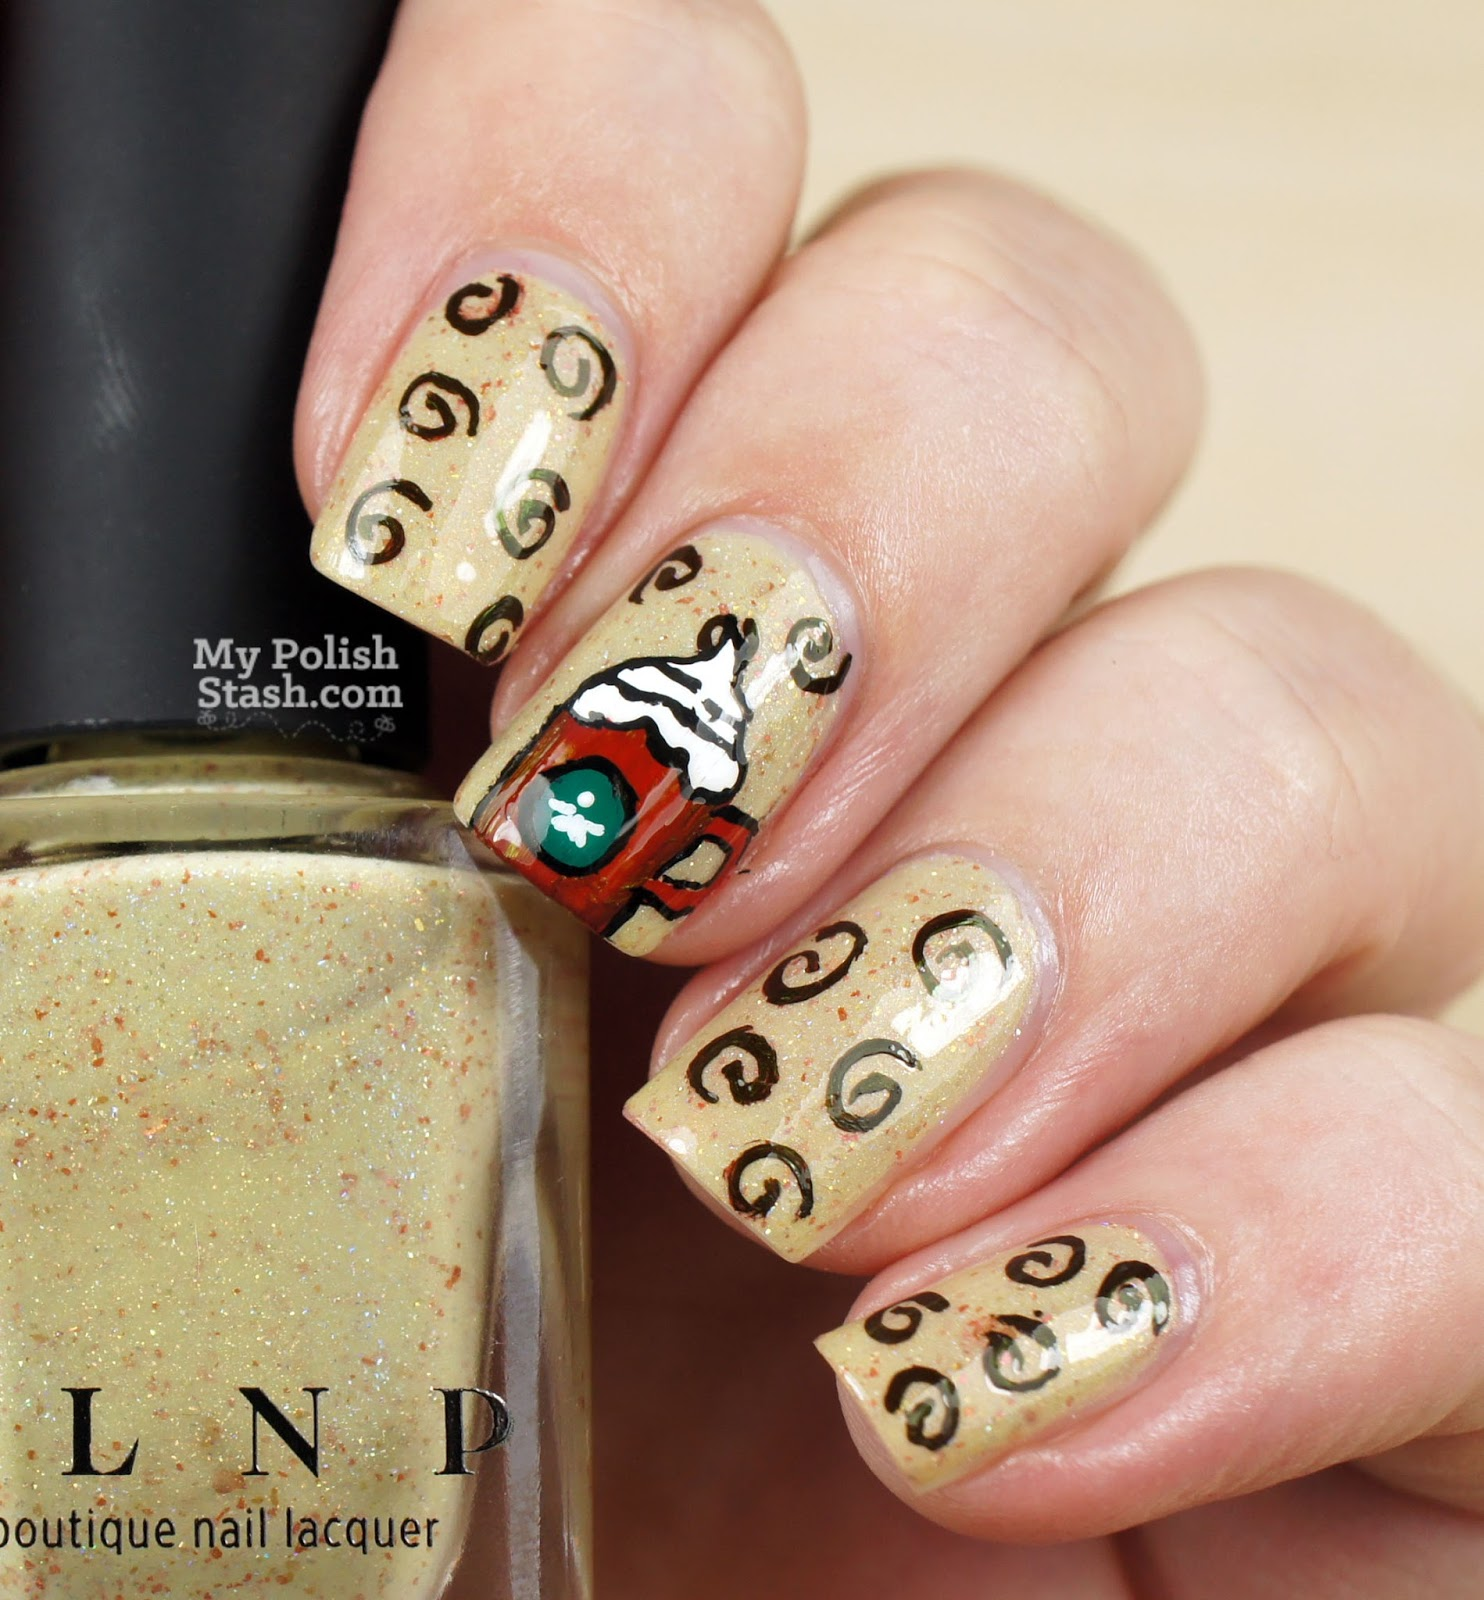 eggnog nail design